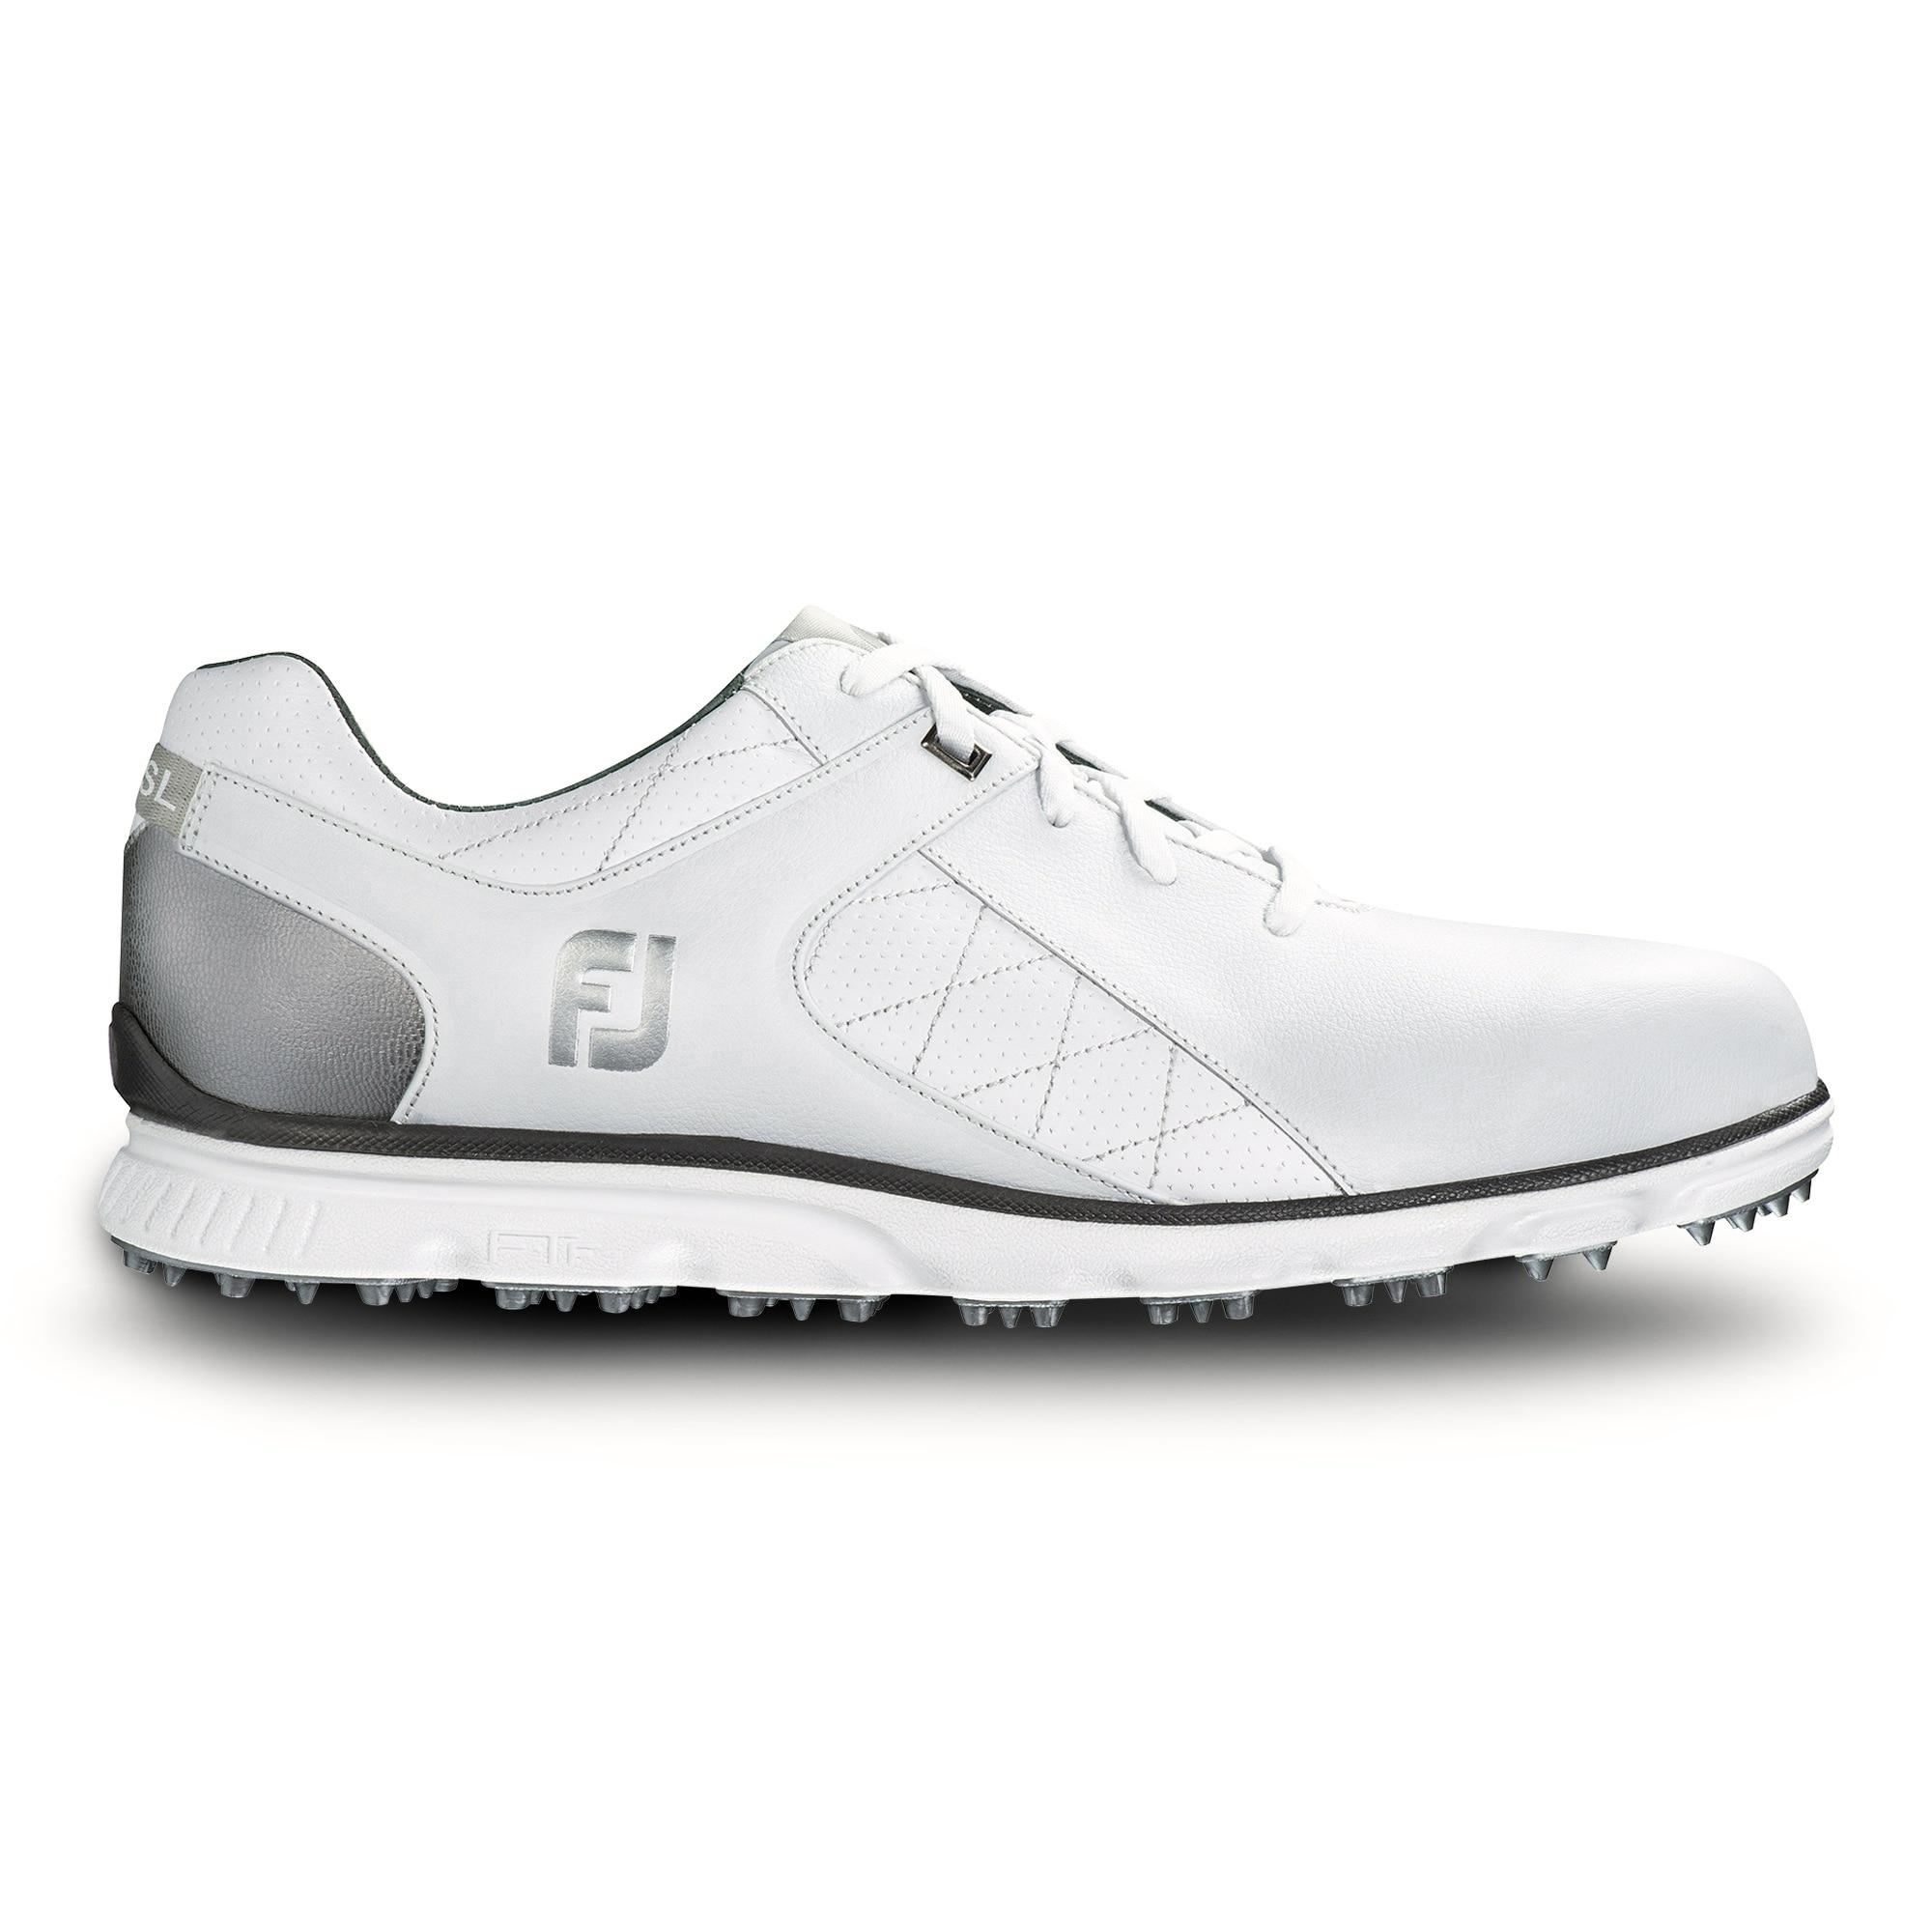 Pro/SL Golf Shoes | FootJoy